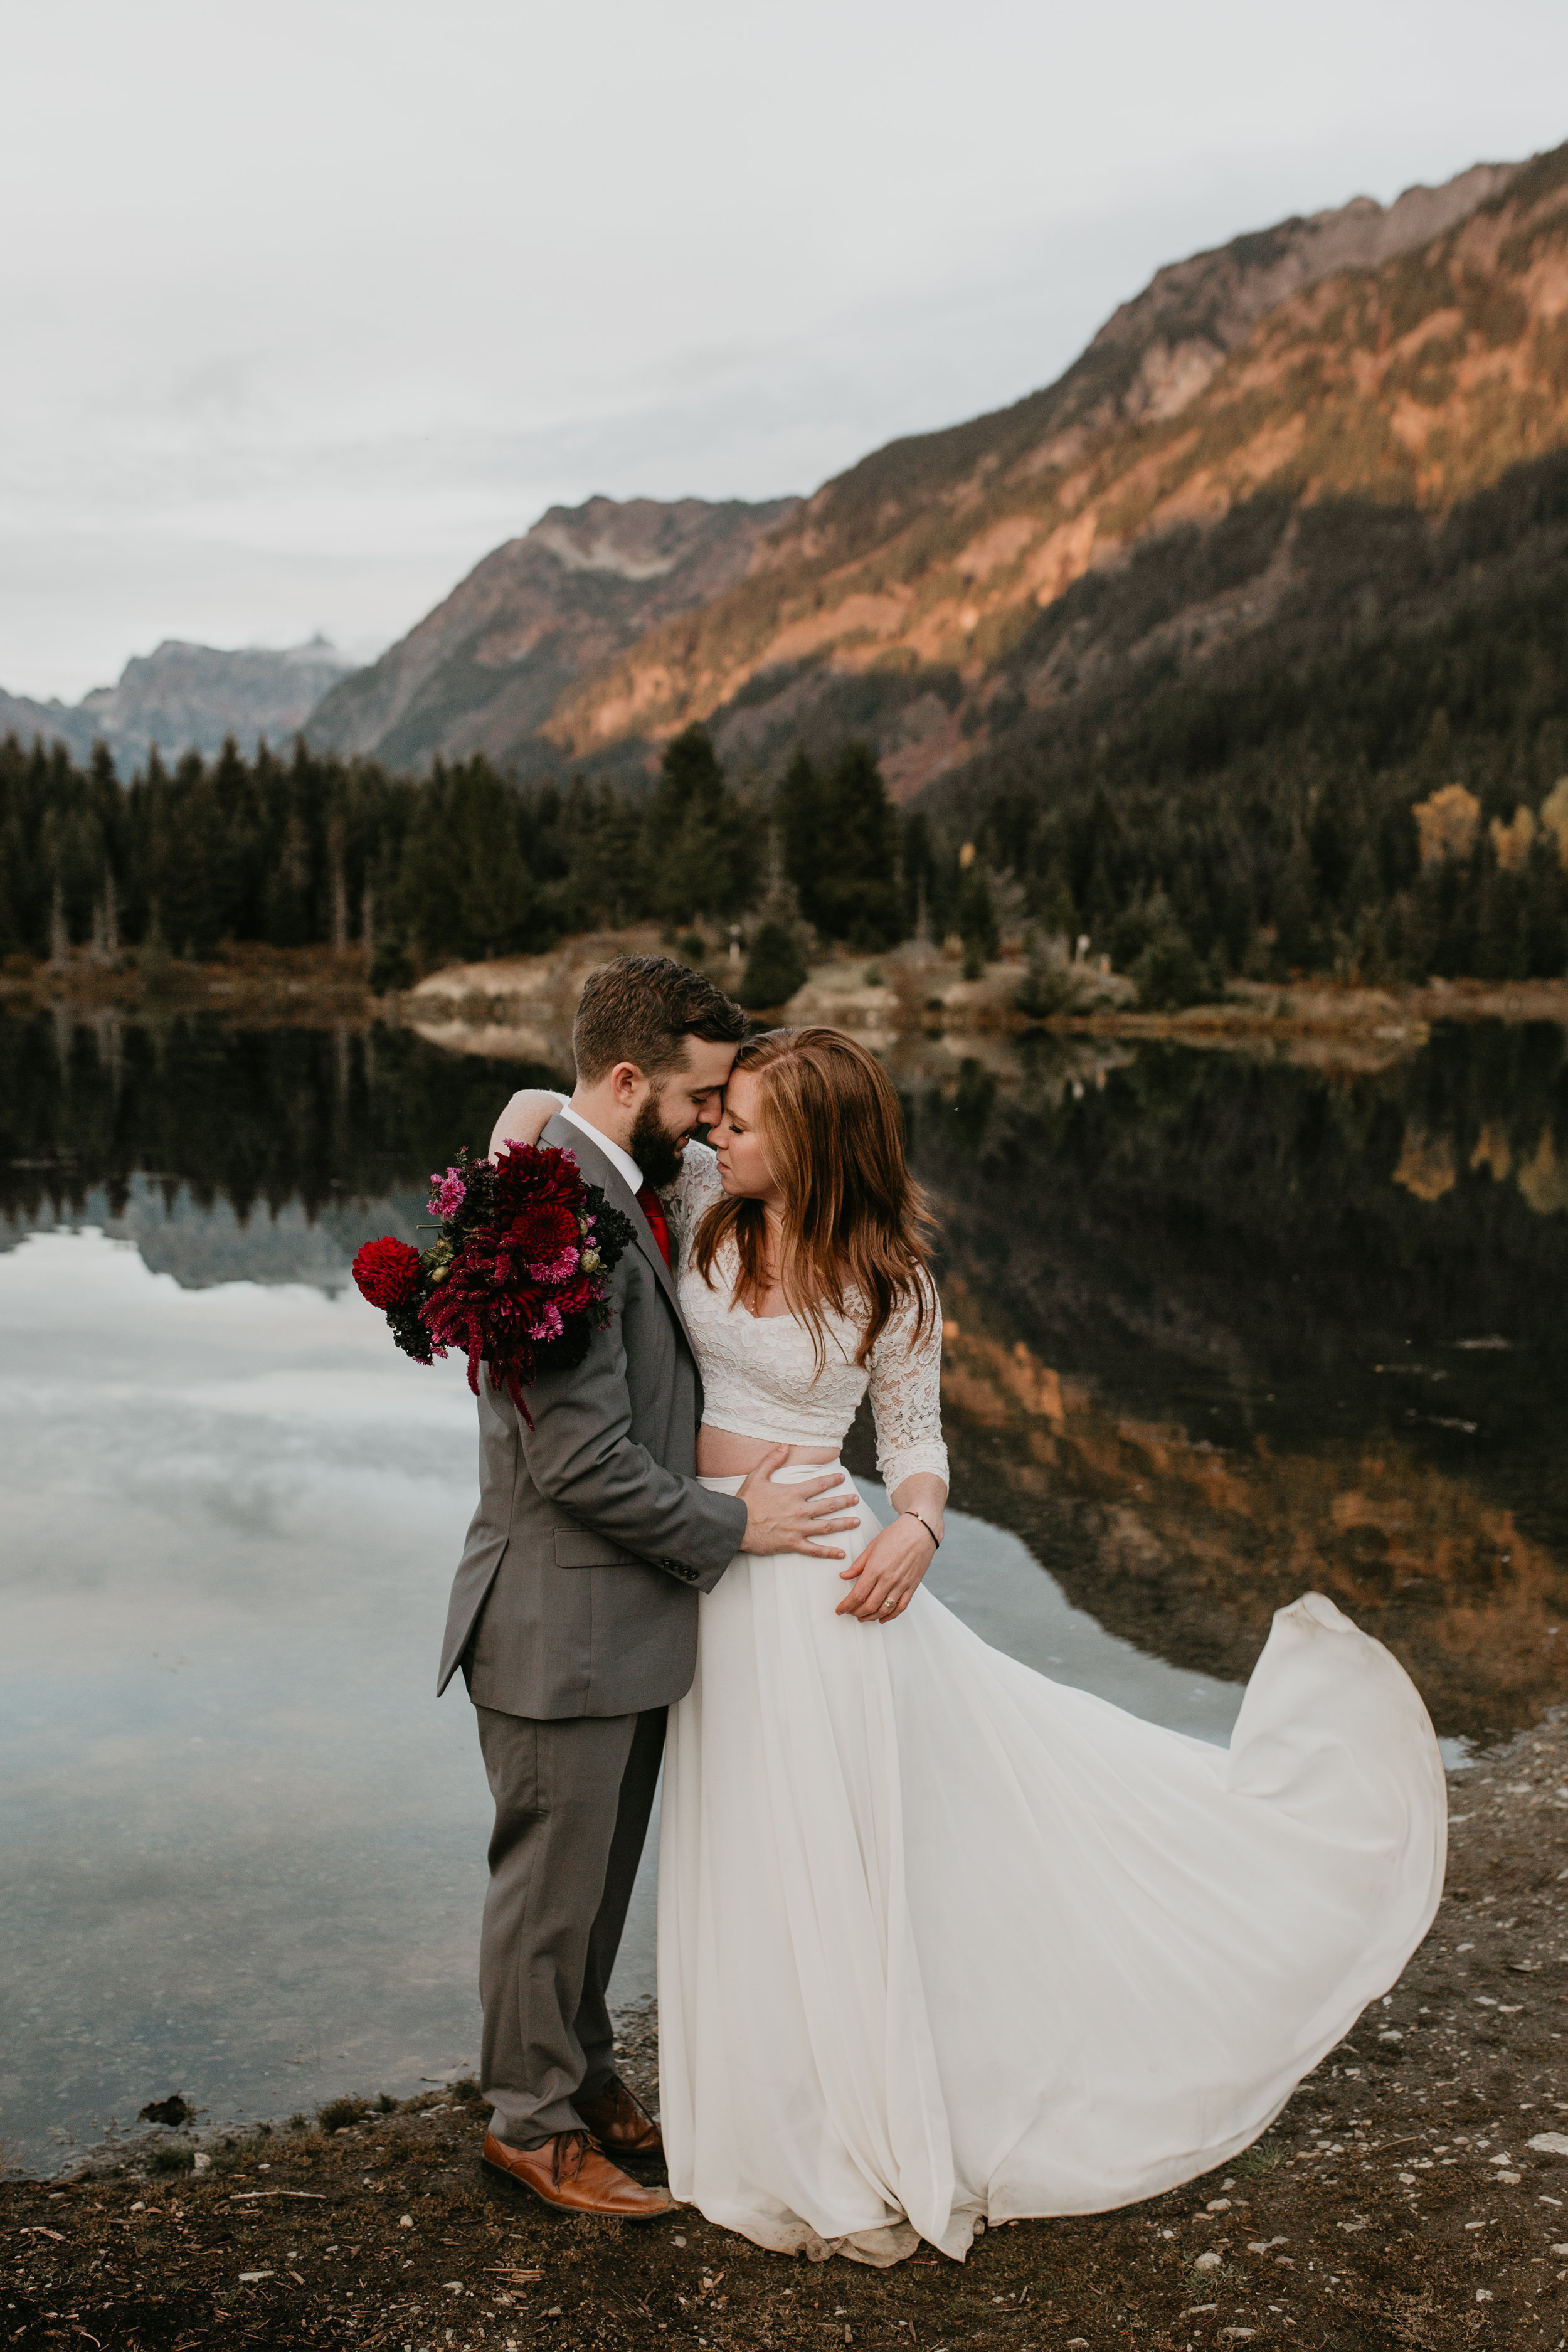 nicole-daacke-photography-mountain-view-elopement-at-gold-creek-pond-snoqualmie-washington-wa-elopement-photographer-photography-adventure-elopement-in-washington-fall-lakeside-golden-sunset-boho-fun-bride-0563.jpg